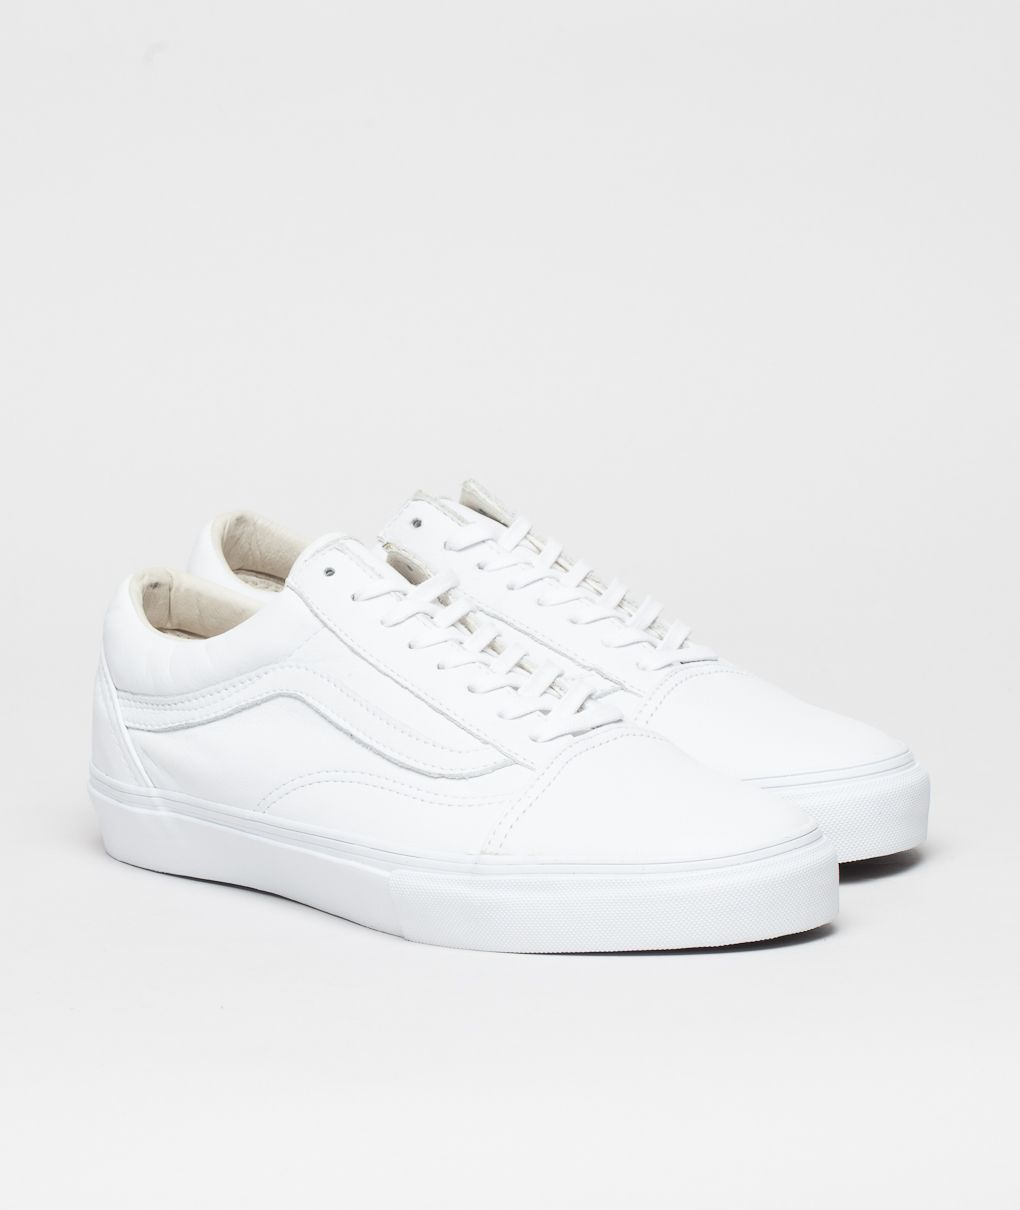 White vans shoes, White leather vans